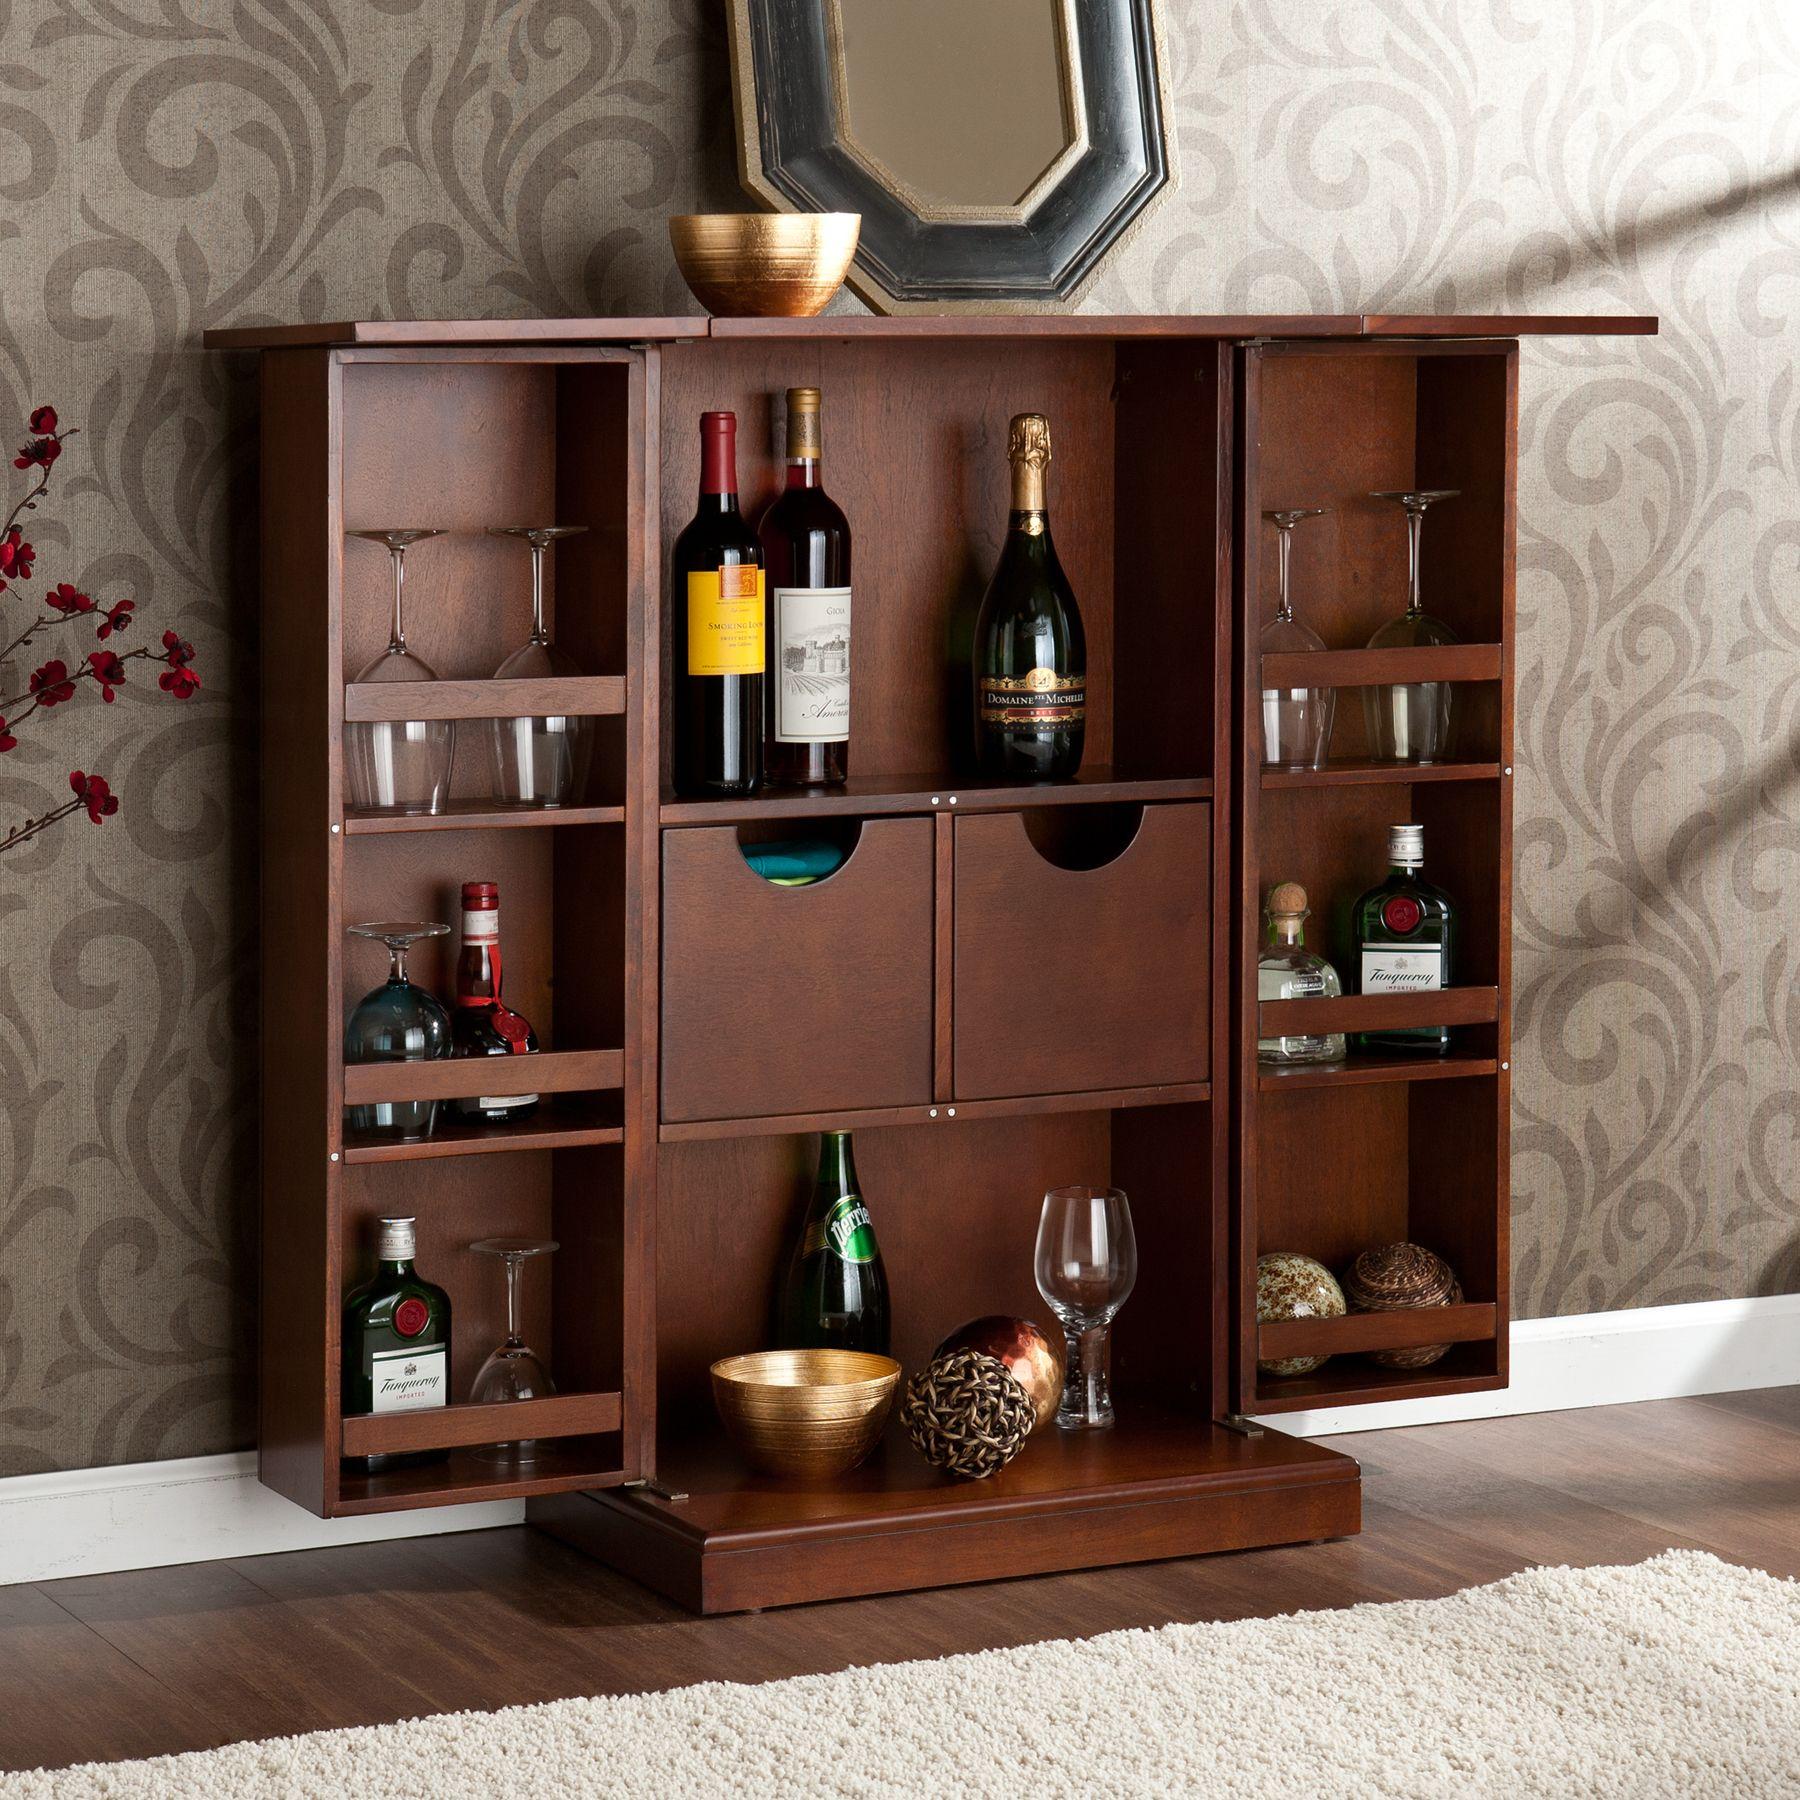 Mini Bar Cabinet Design Ideas  httpwwwthedomainfairycomminibarcabinetdesignideas